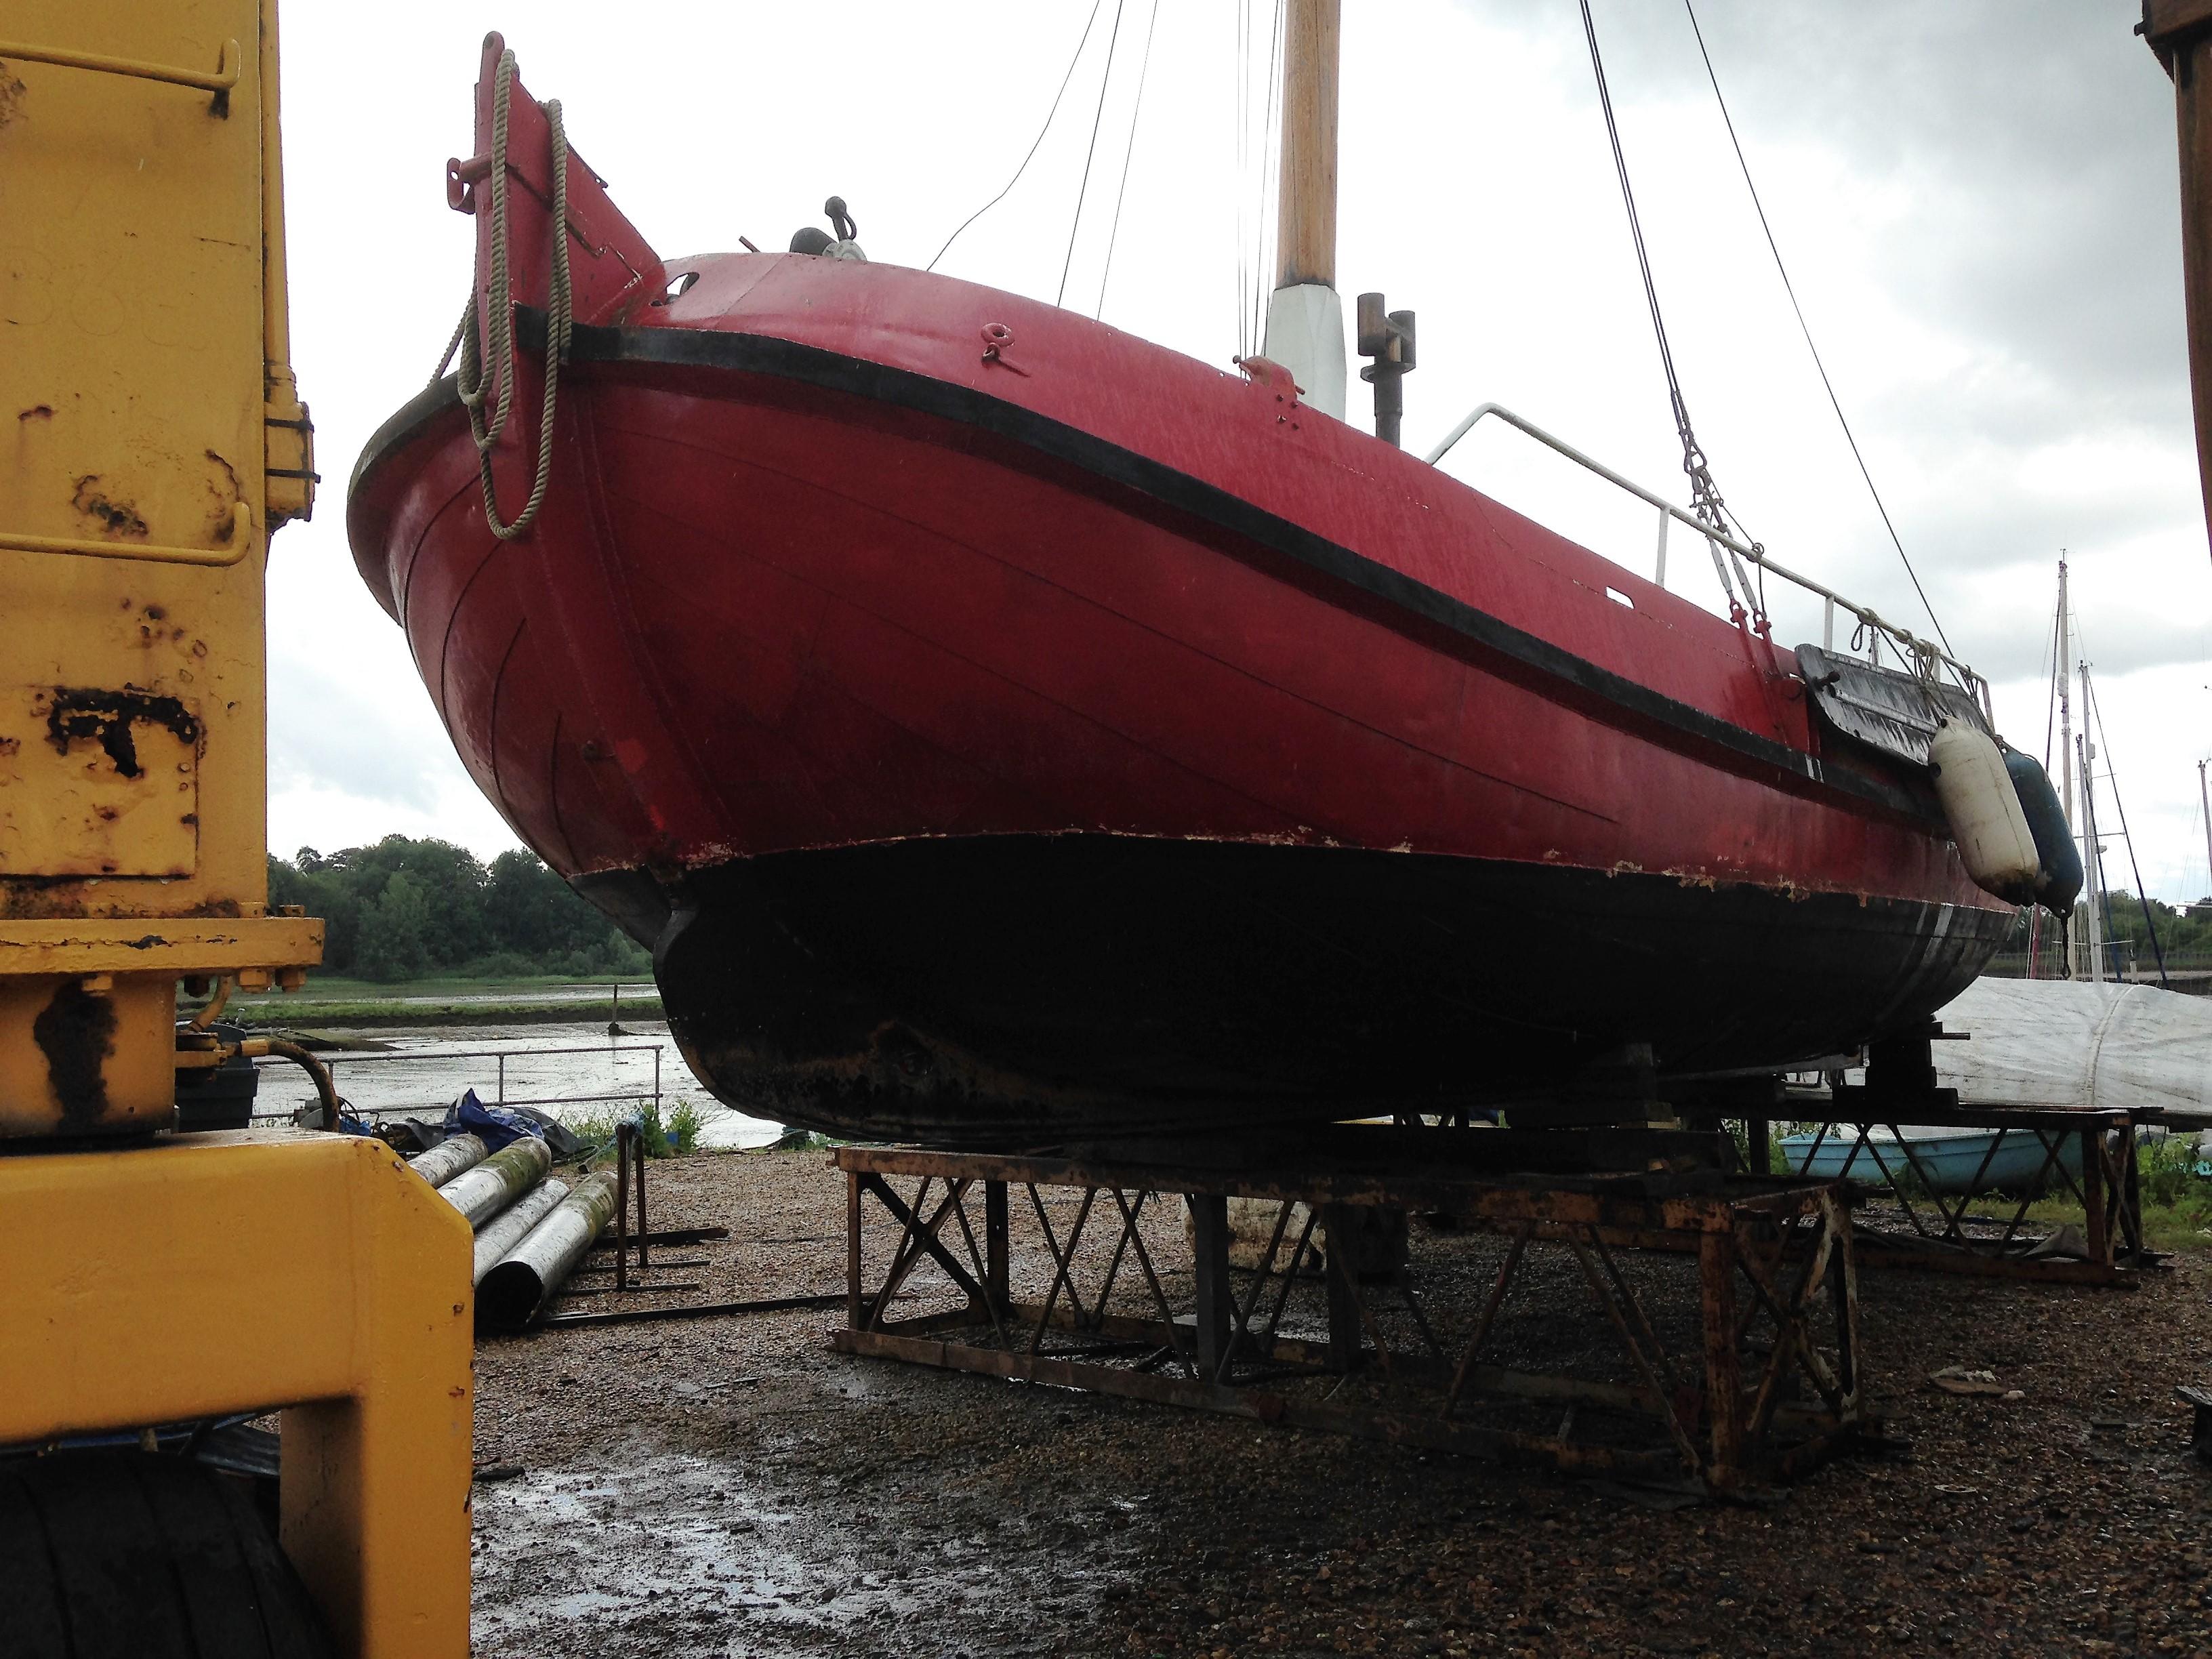 Life on the yard - Melton Boatyard